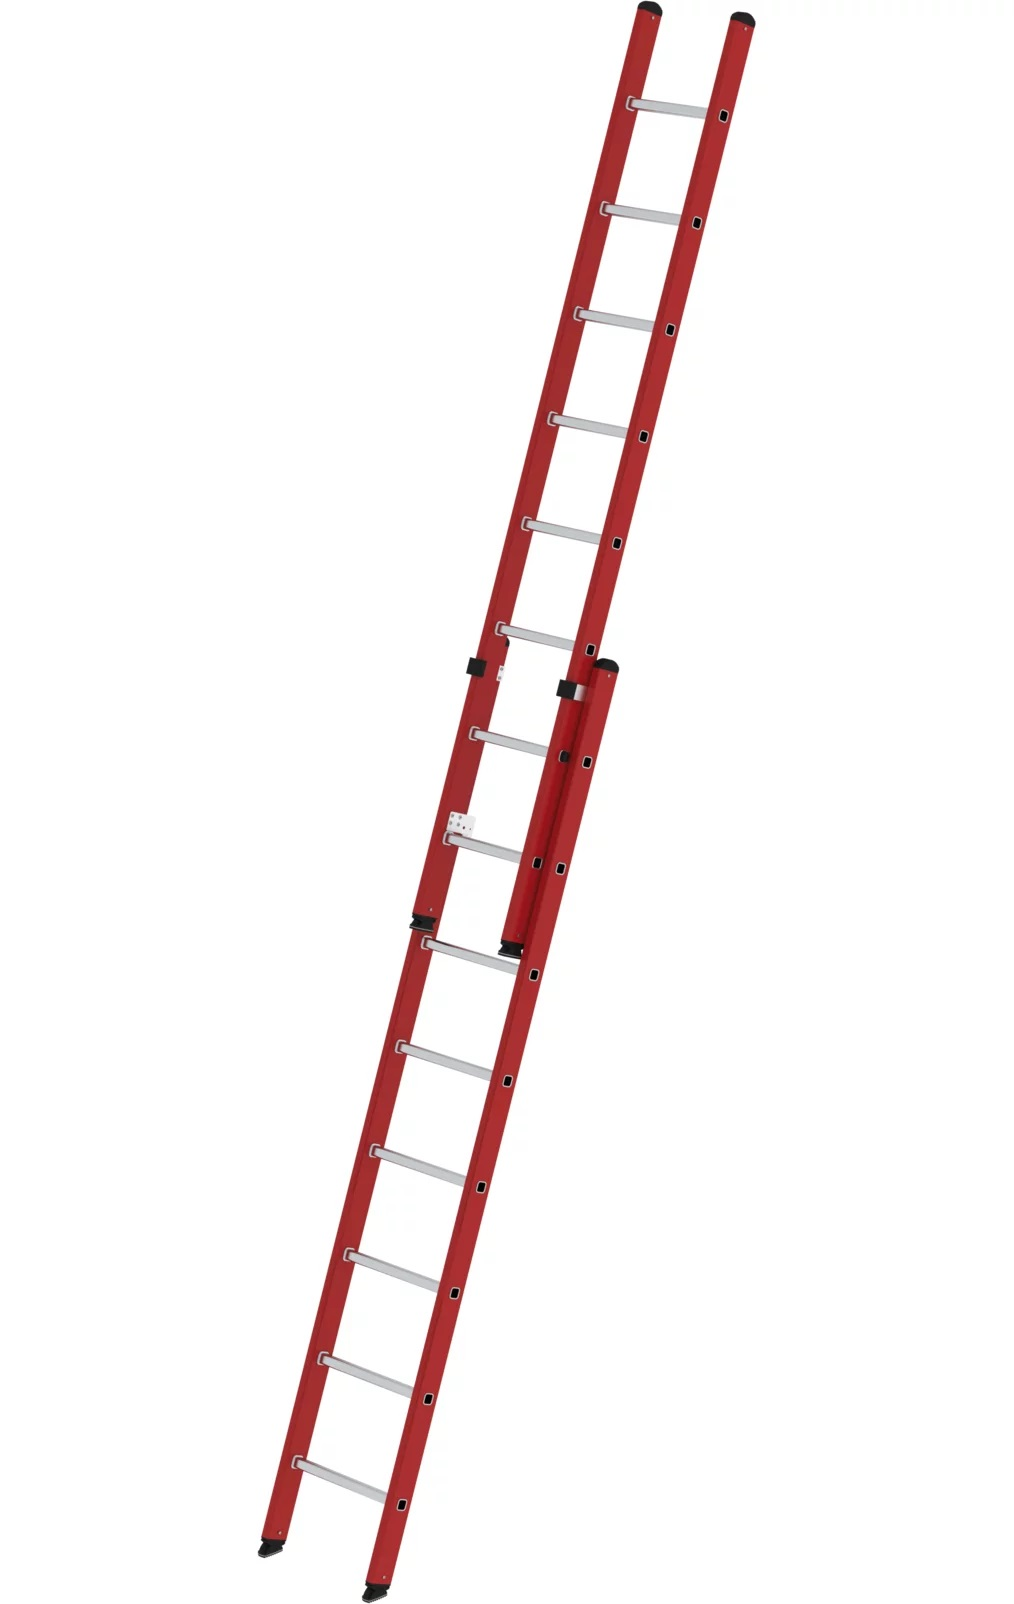 Kunststof tweedelige opsteekladder, 2x8, 35108